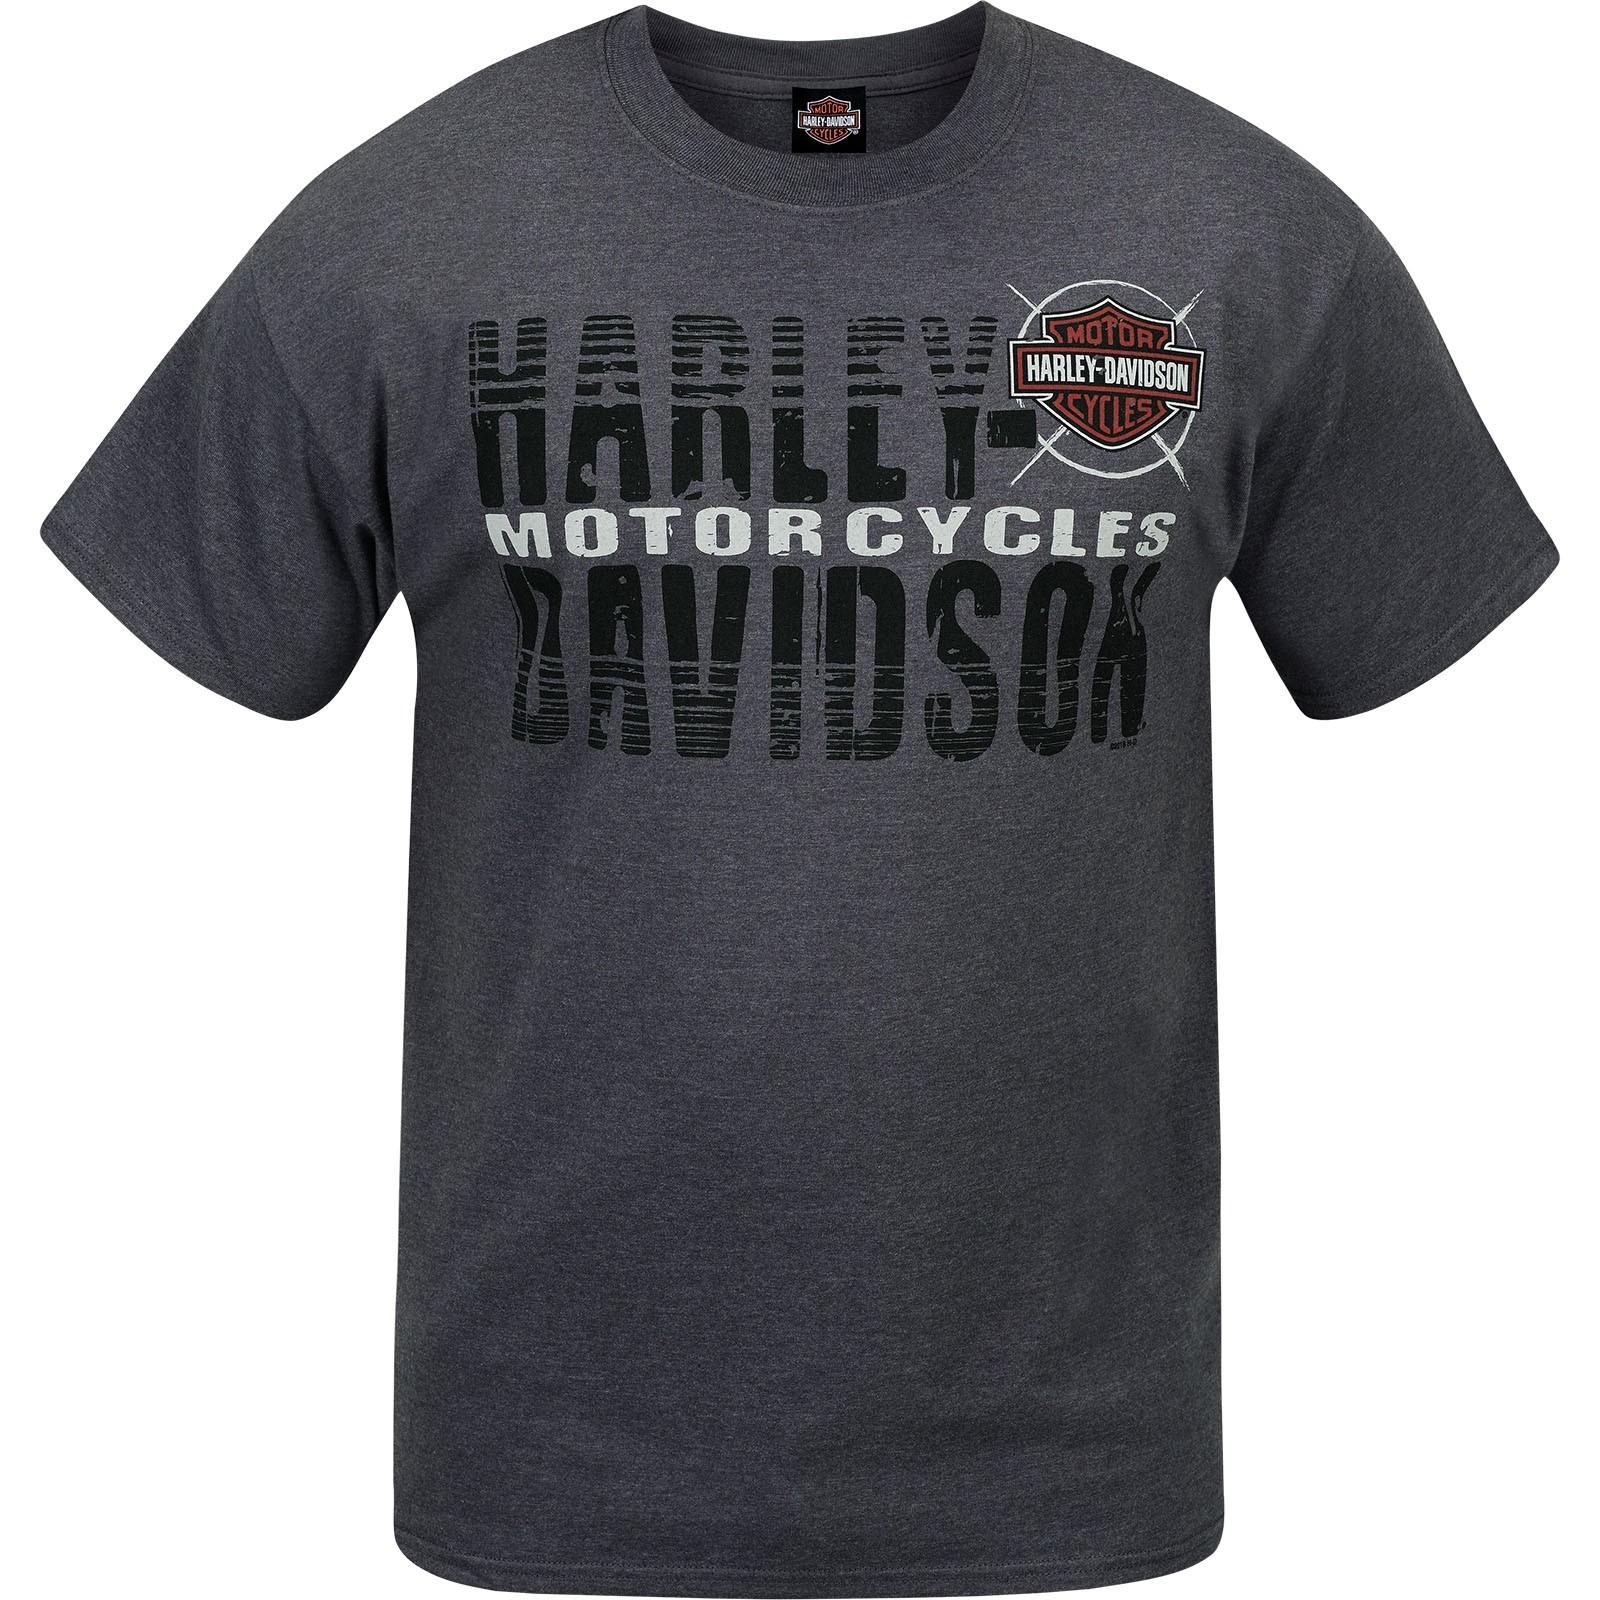 Harley-Davidson Men's Short-Sleeve T-Shirt - Camp Foster | Name Fade